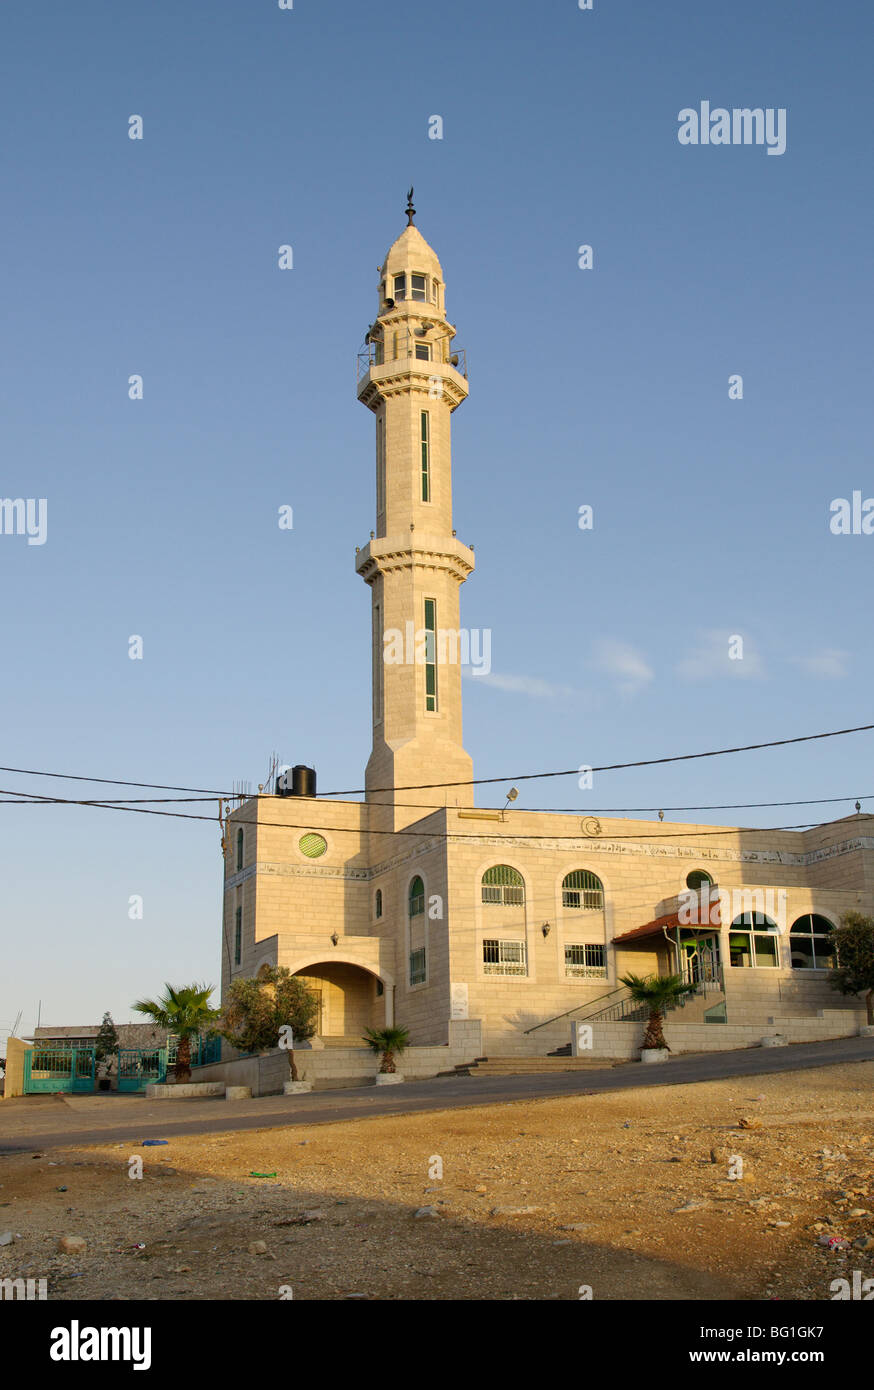 Mosque in al-Jib, West Bank, Palestine - Stock Image